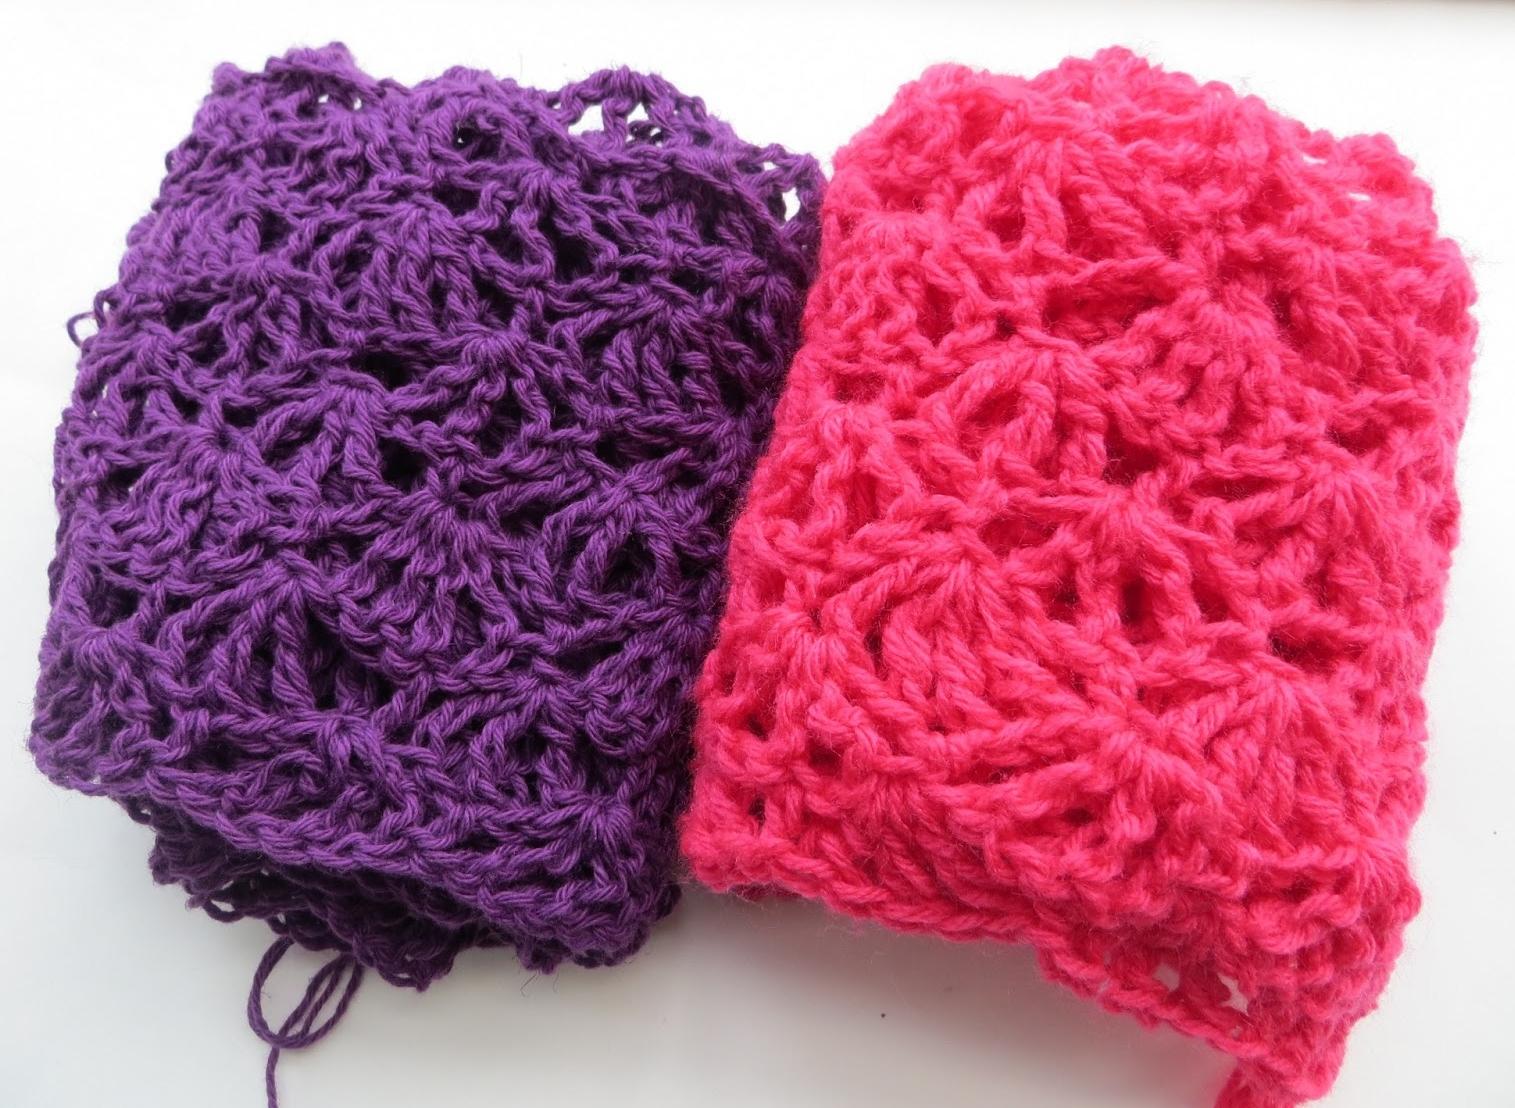 Crochet Dreamz: May 2013